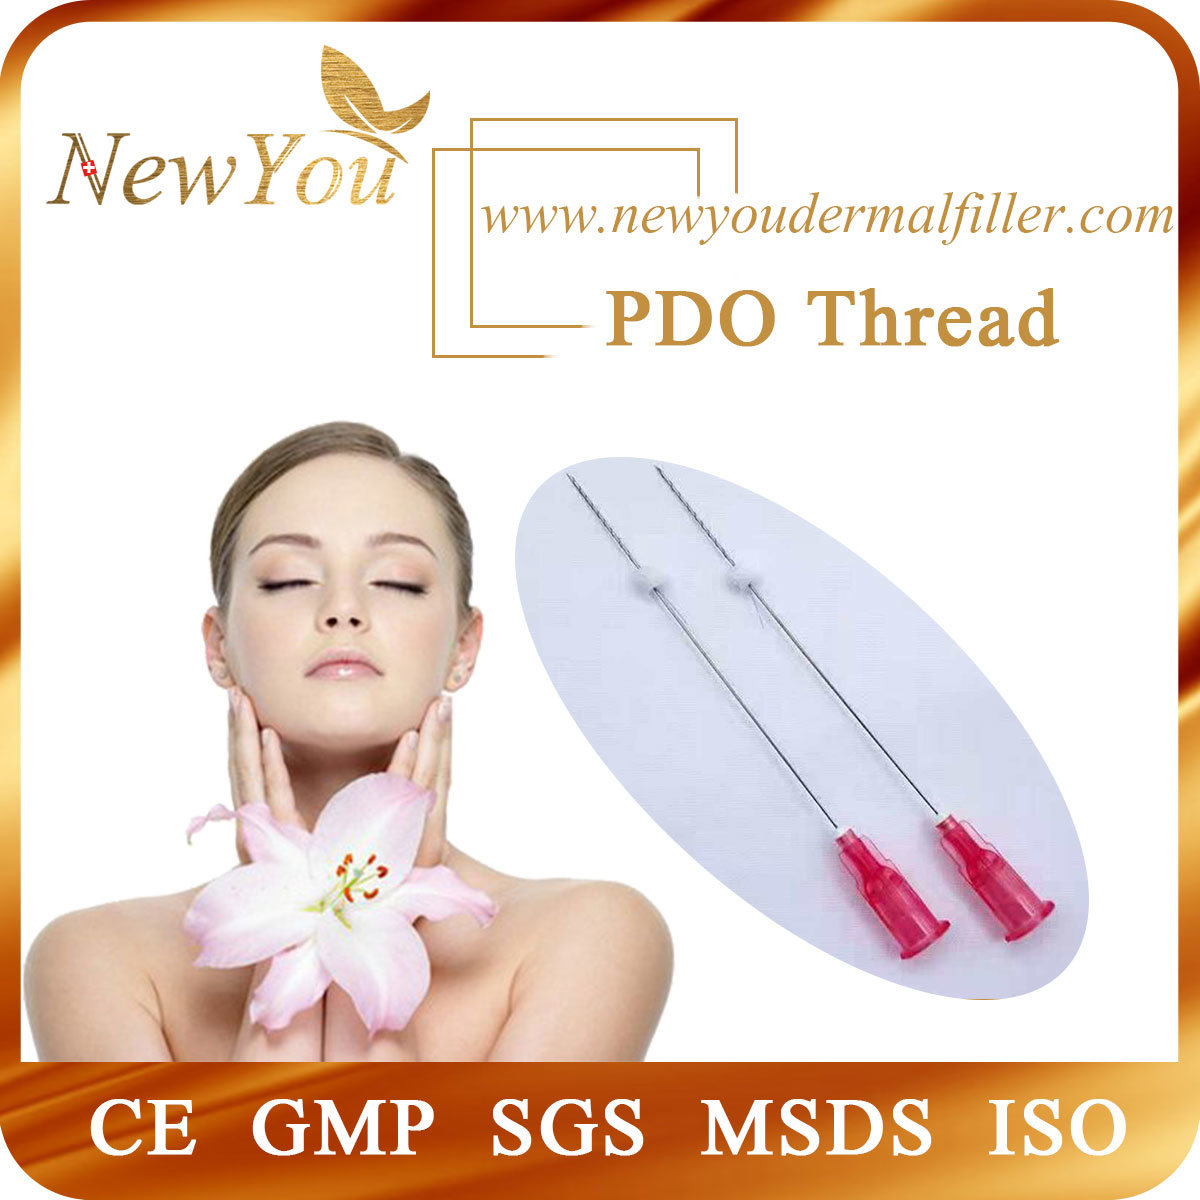 2017 Beauty Products Eye Care Pdo Thread Mono